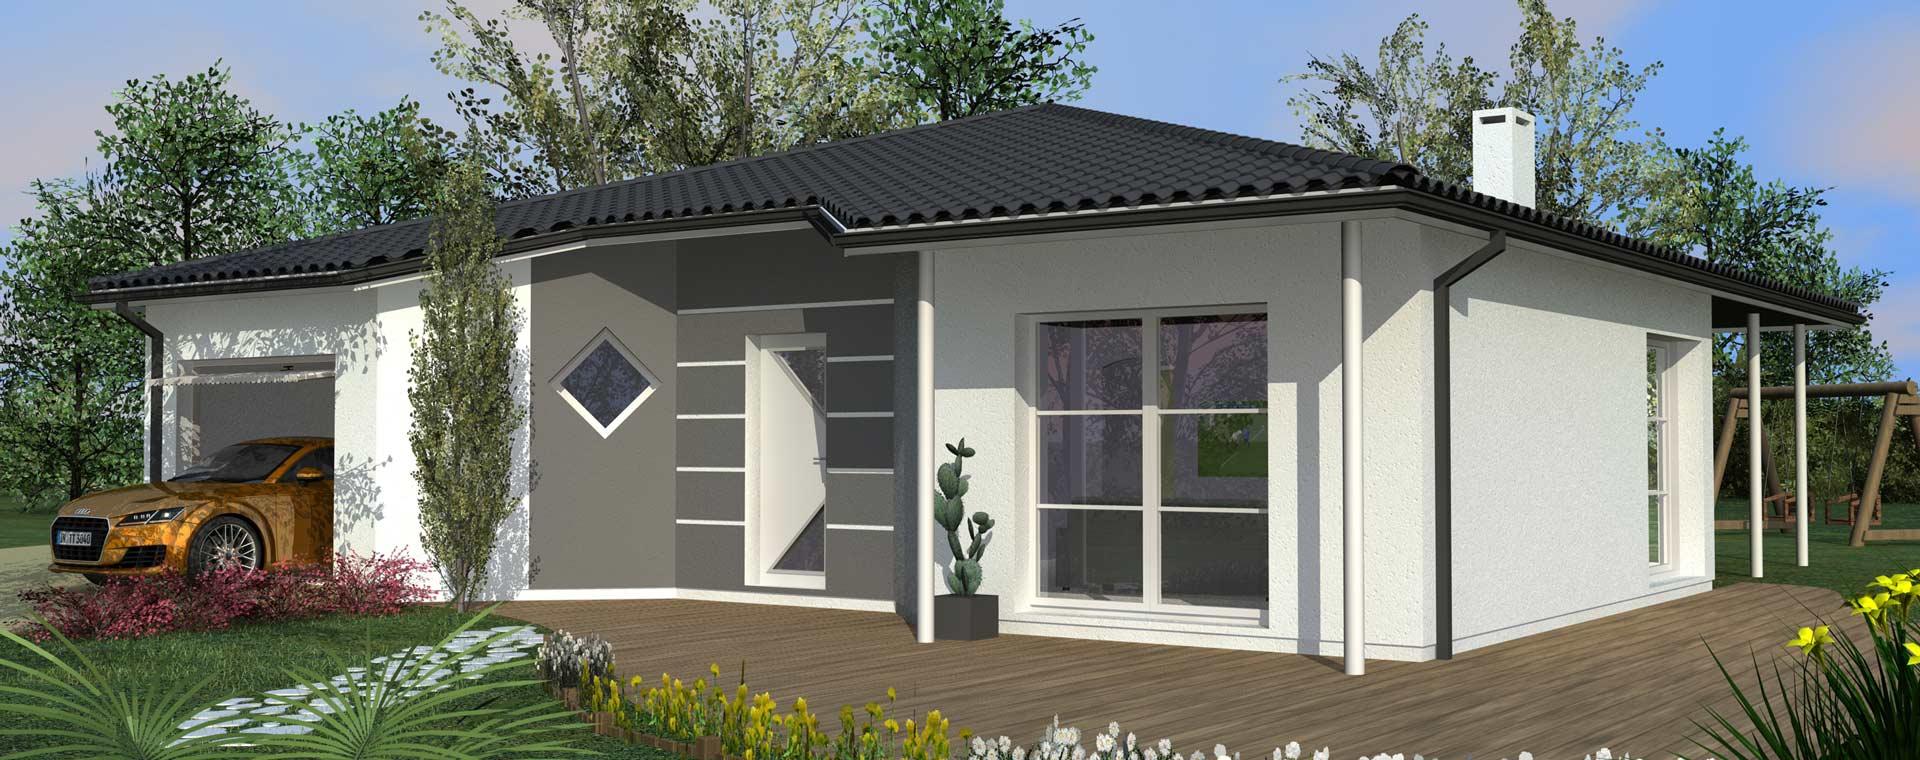 constructeur maison neuve gironde